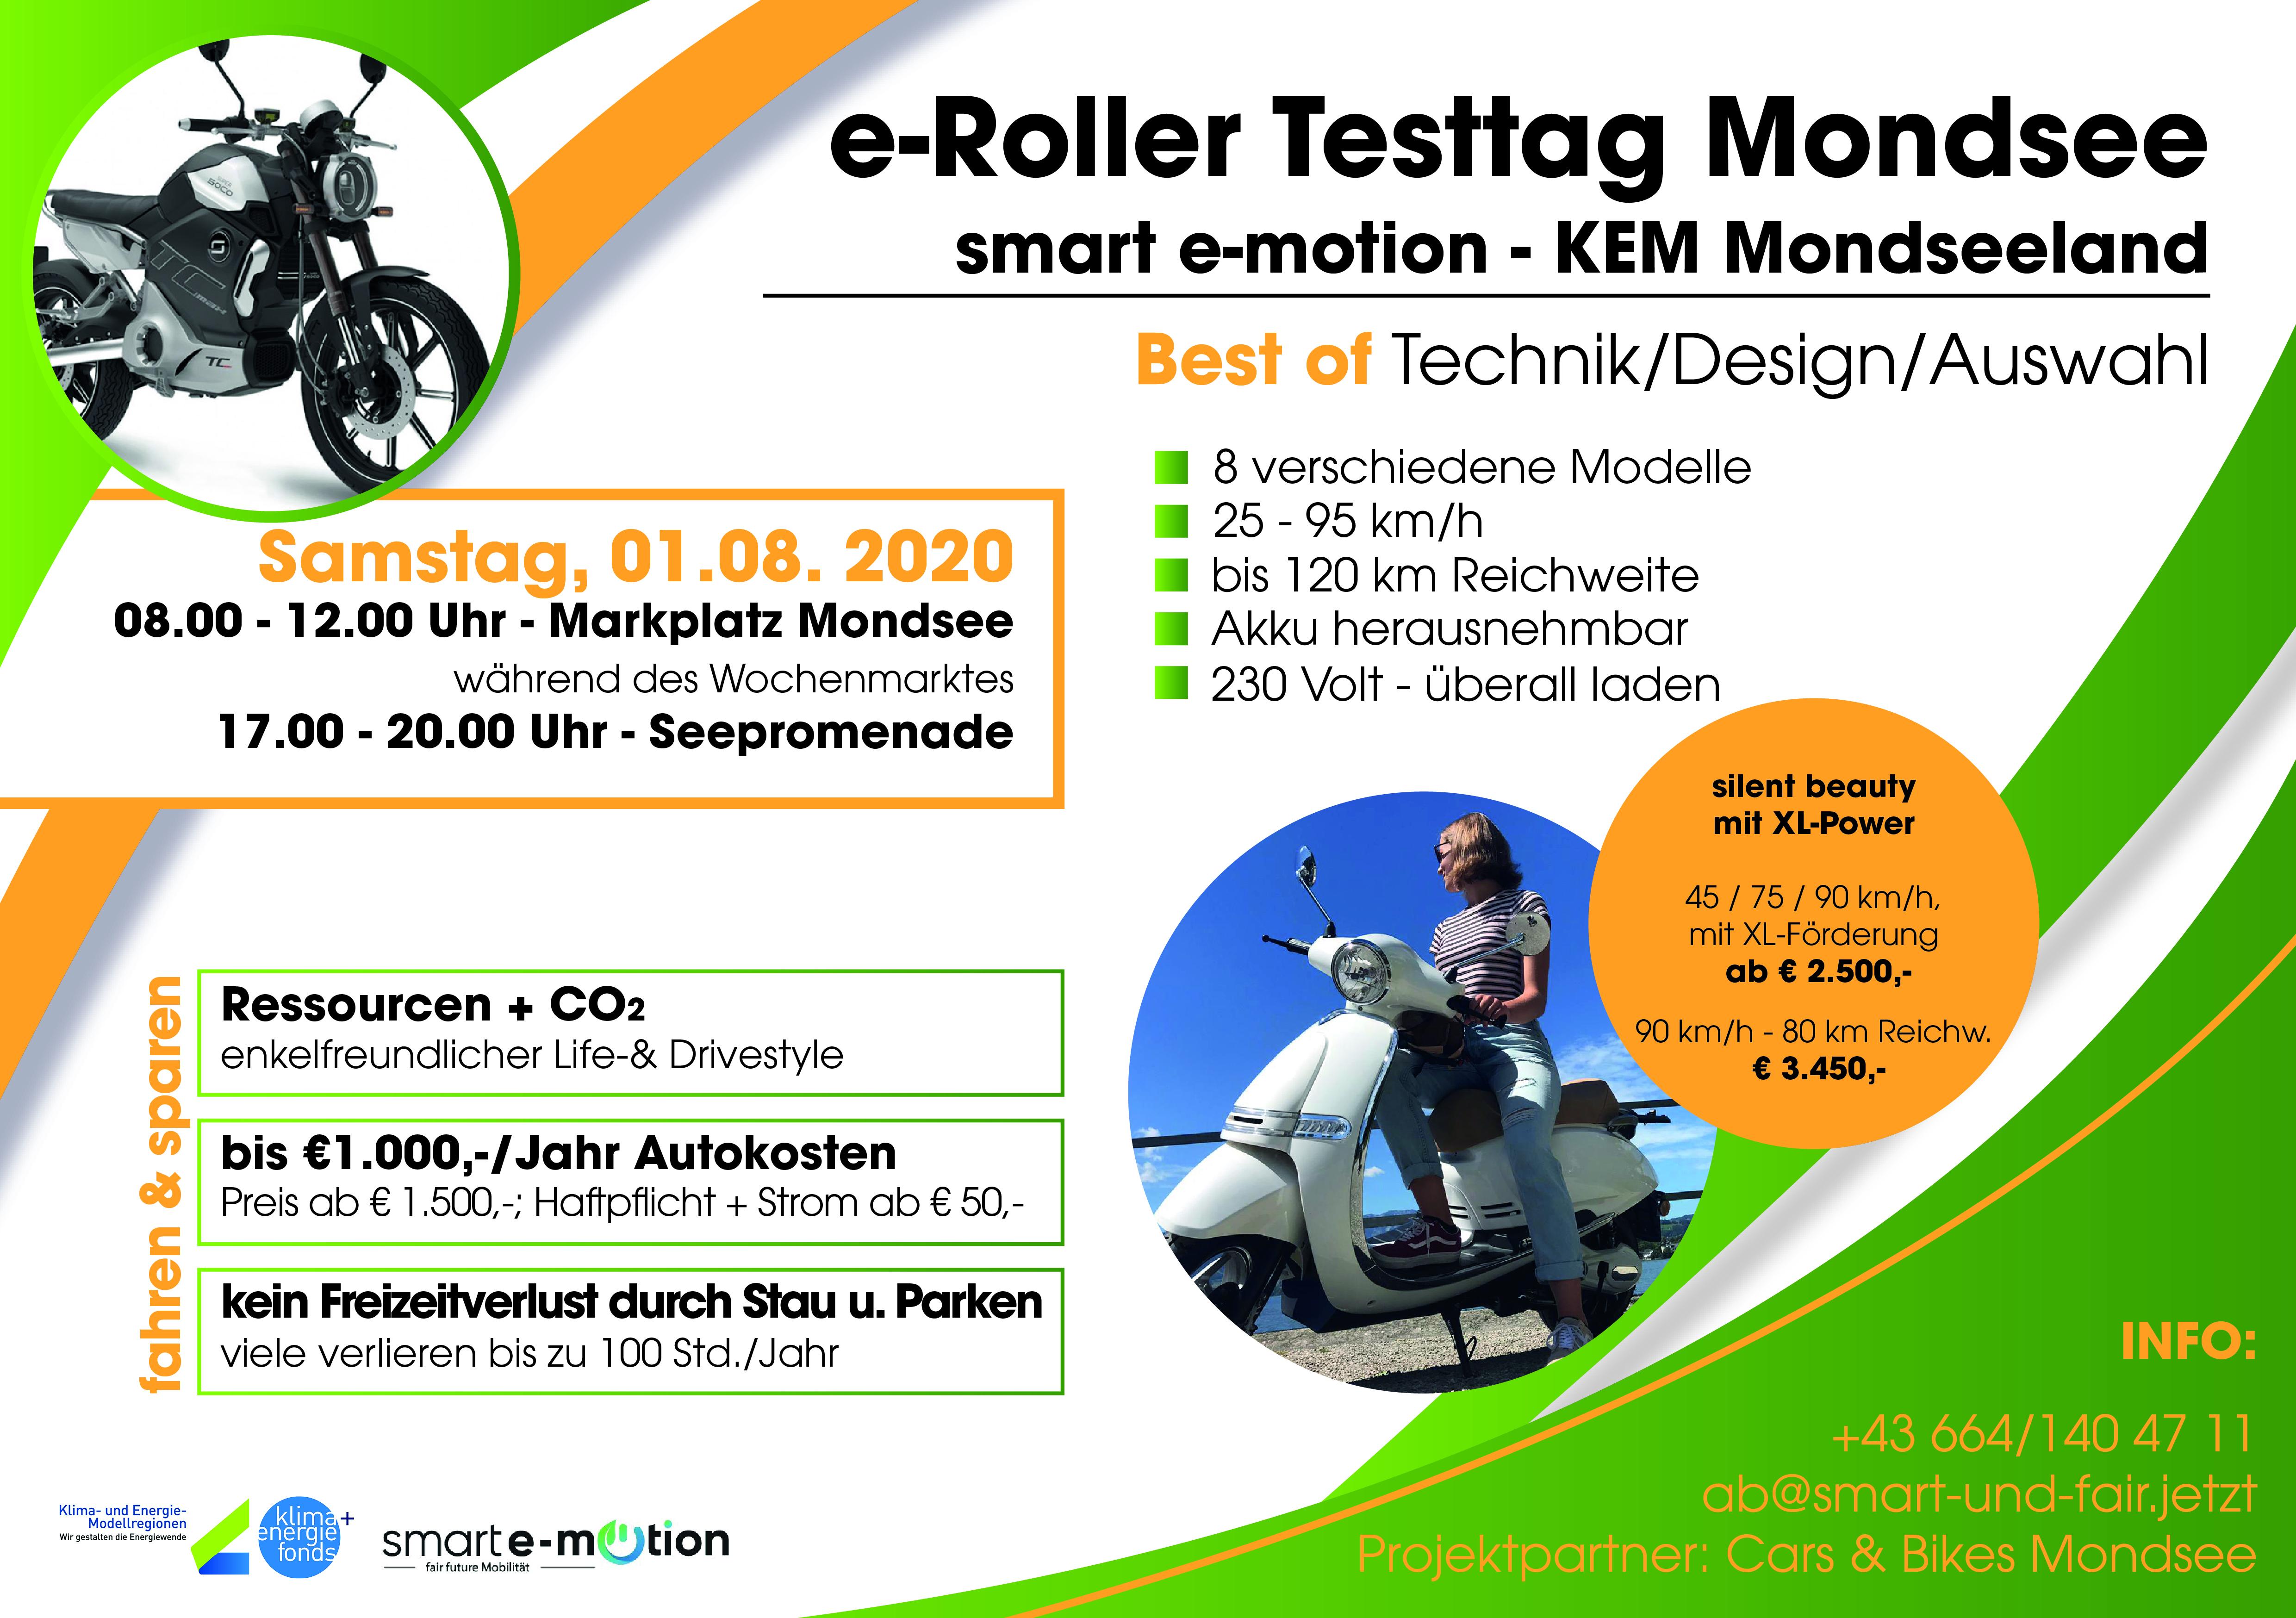 ERoller_Testtag_25072020_final_Plakat_ohne Donnerstag_jpg_2